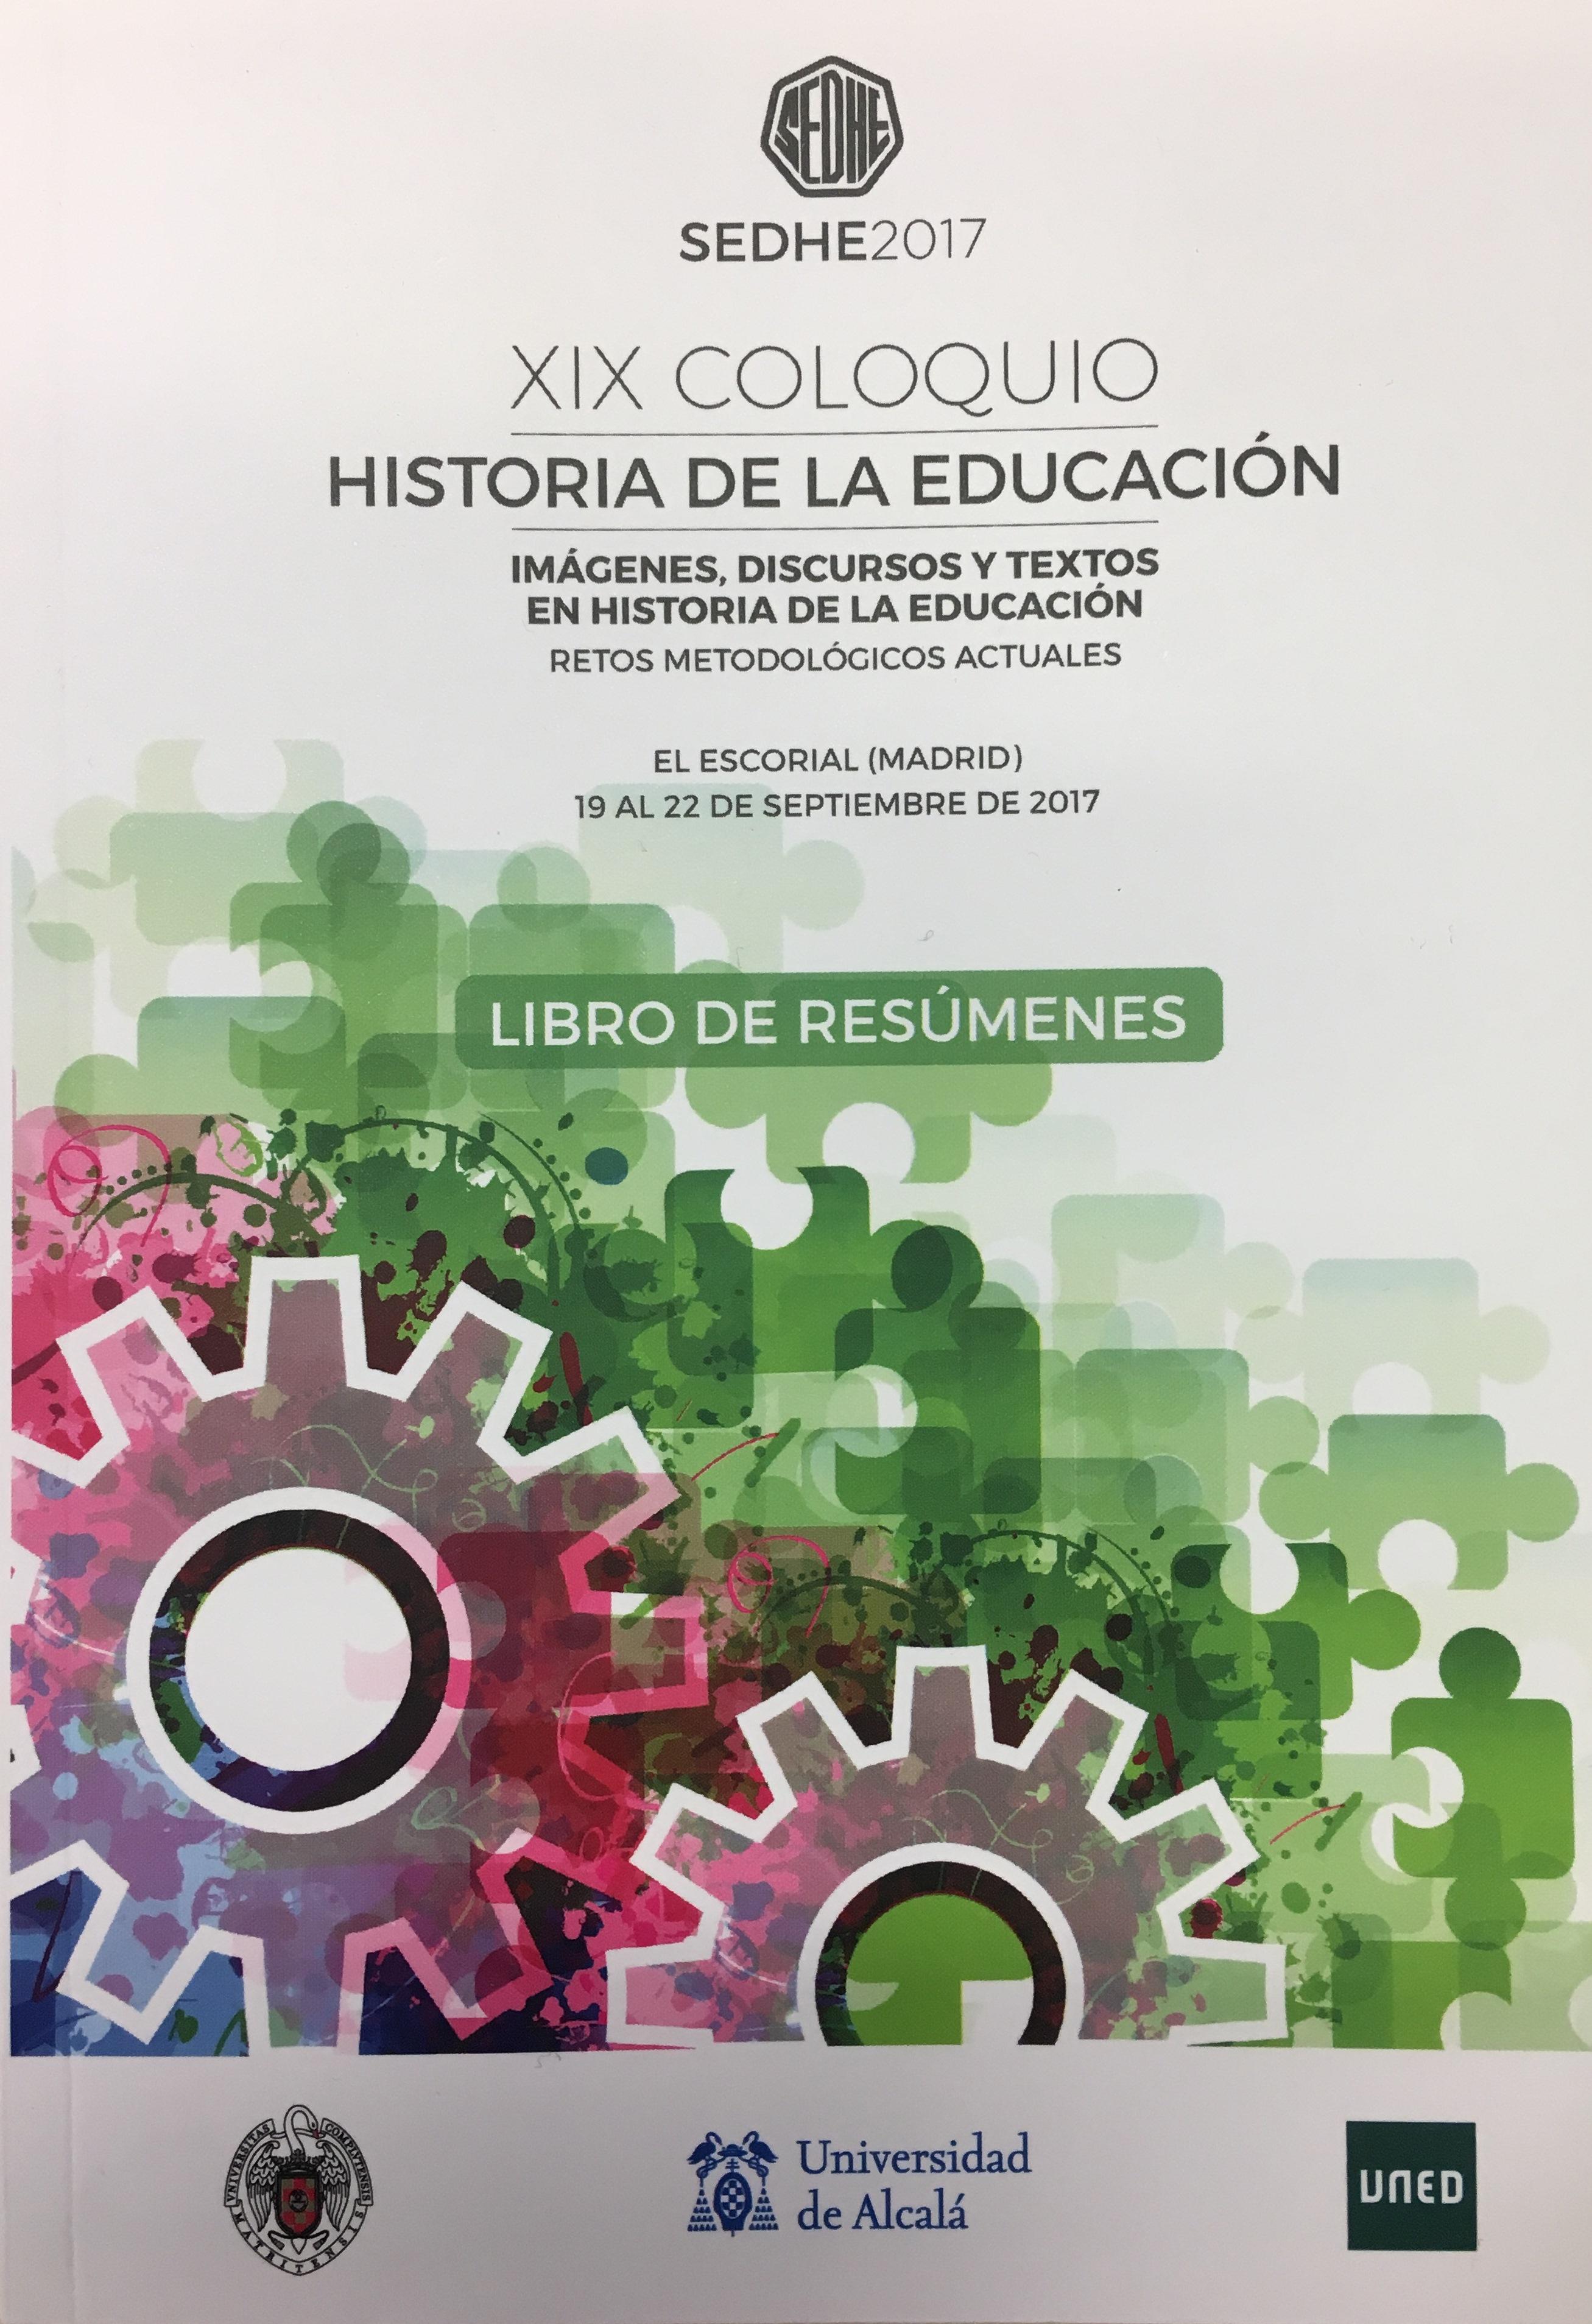 Libro_resumenes_XIX_Coloquio_SEDHE